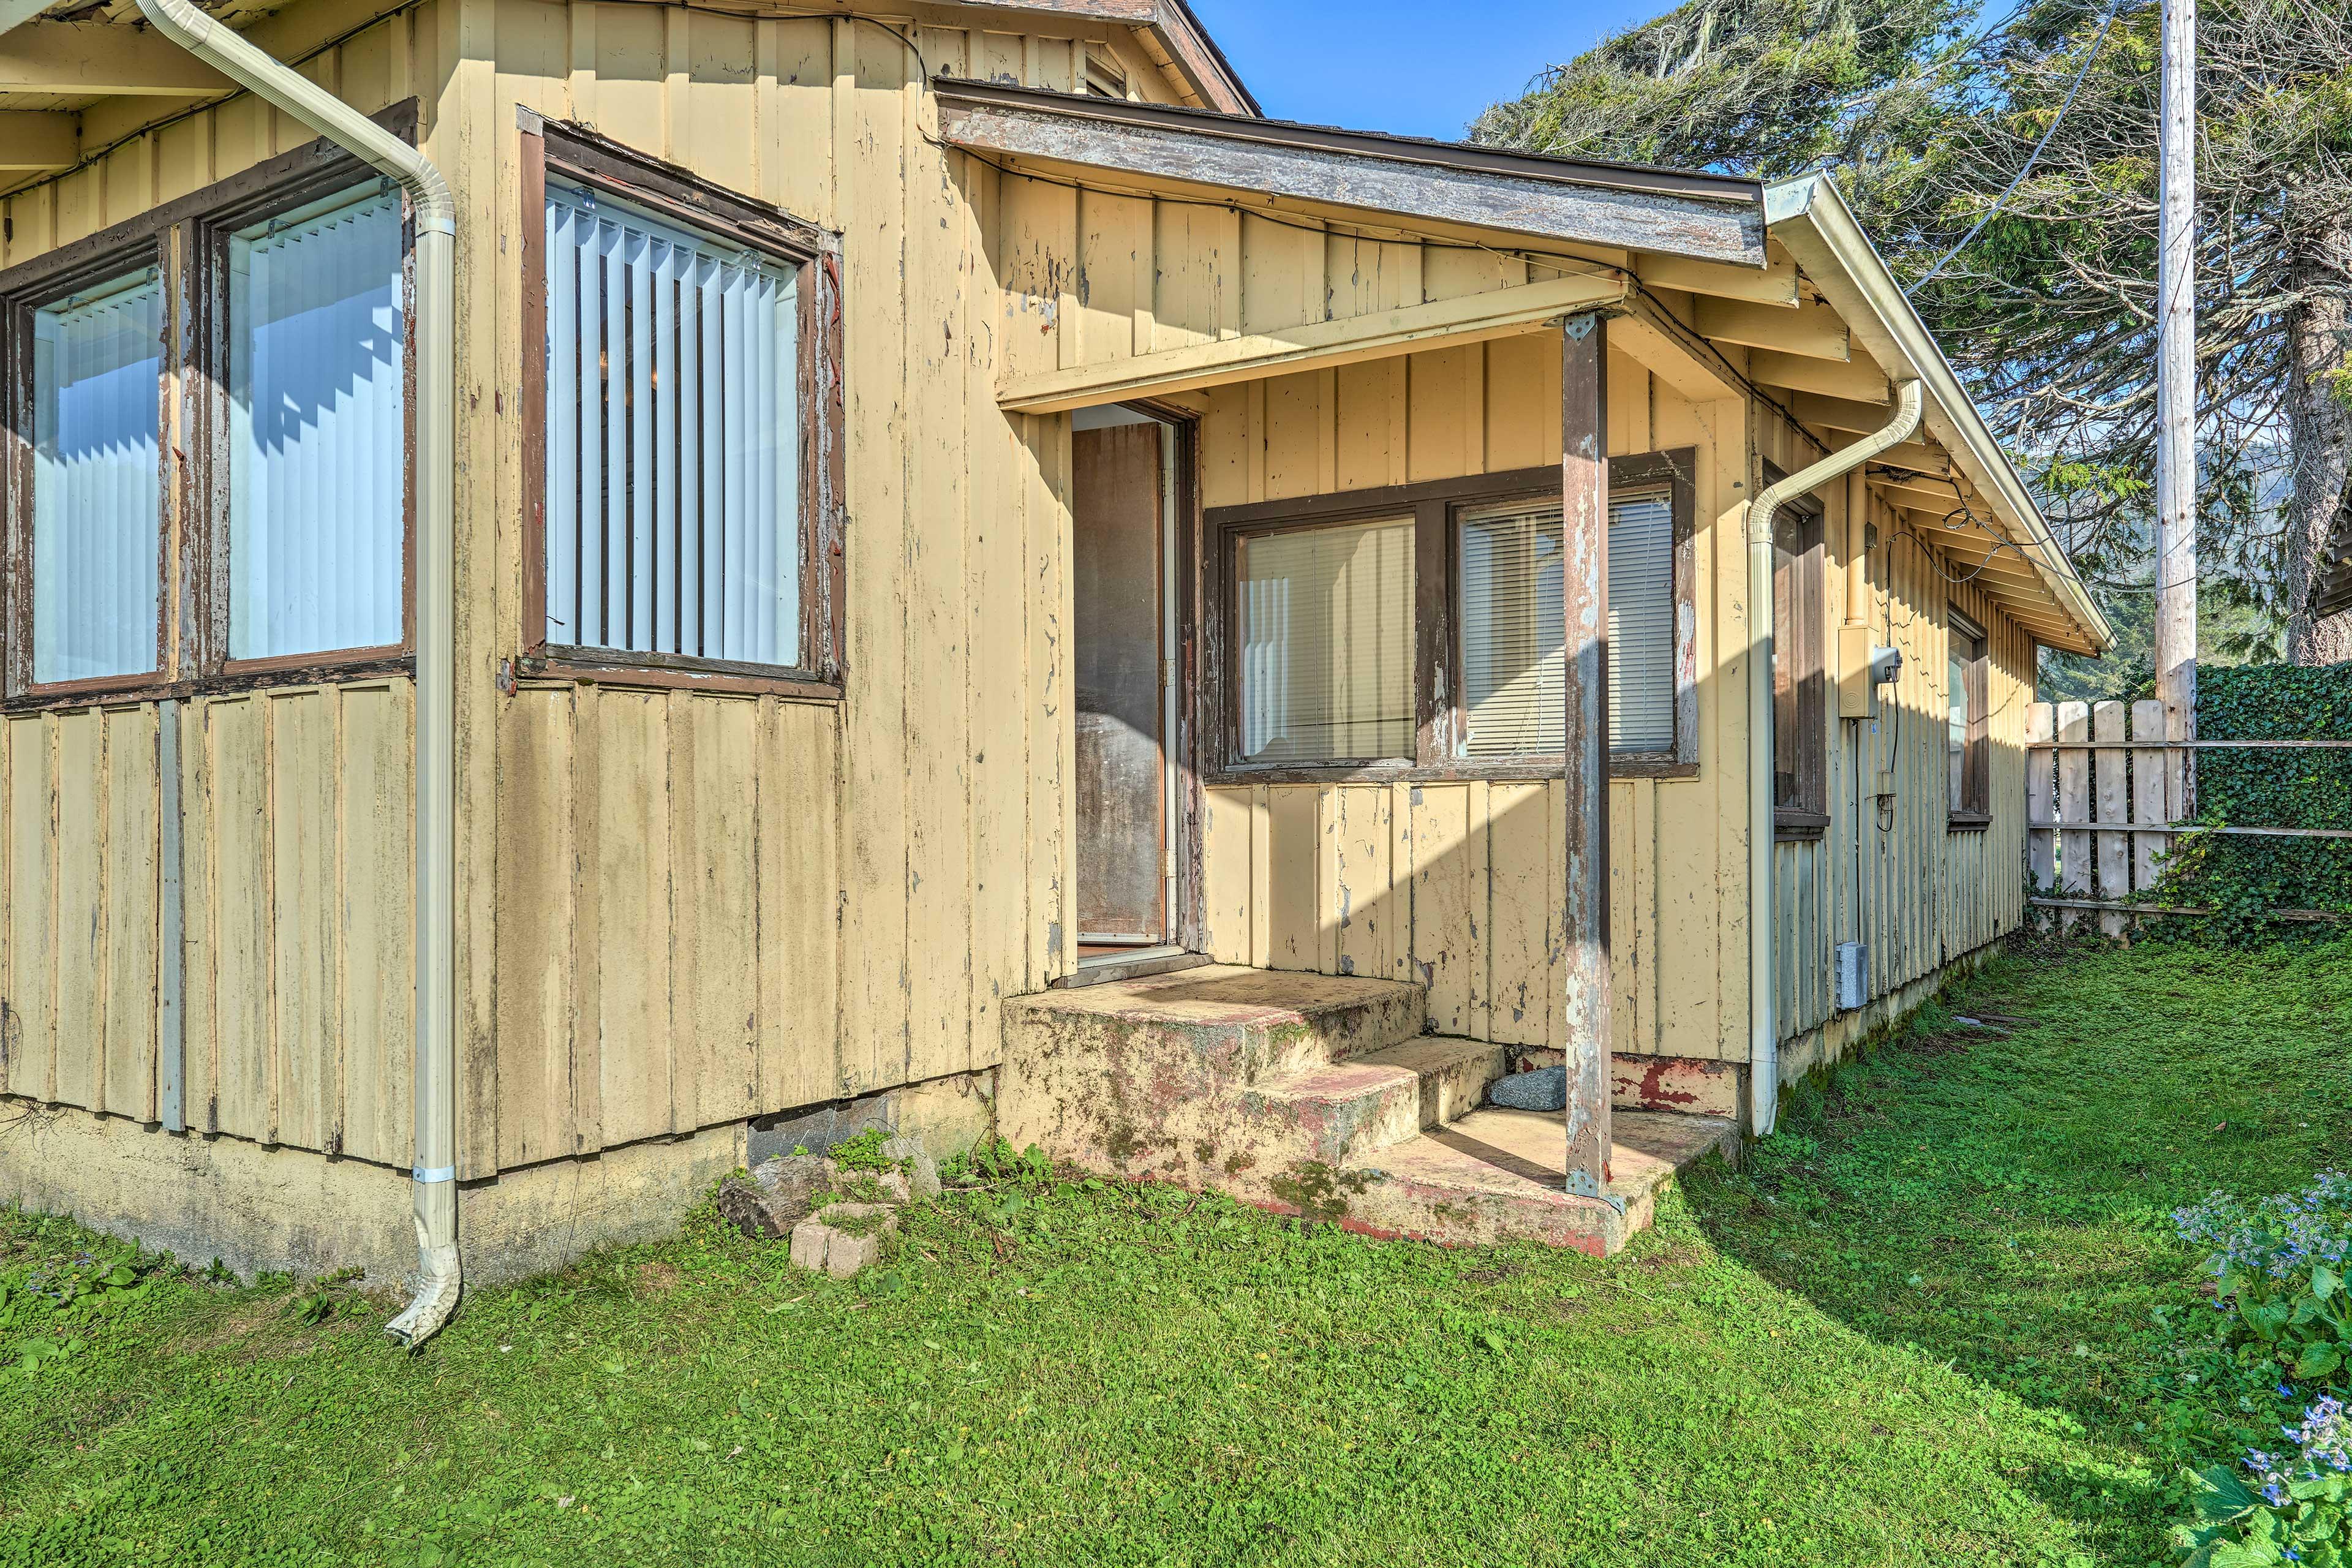 Unwind in this rustic-yet-comfortable 2-bedroom, 1-bathroom vacation rental.